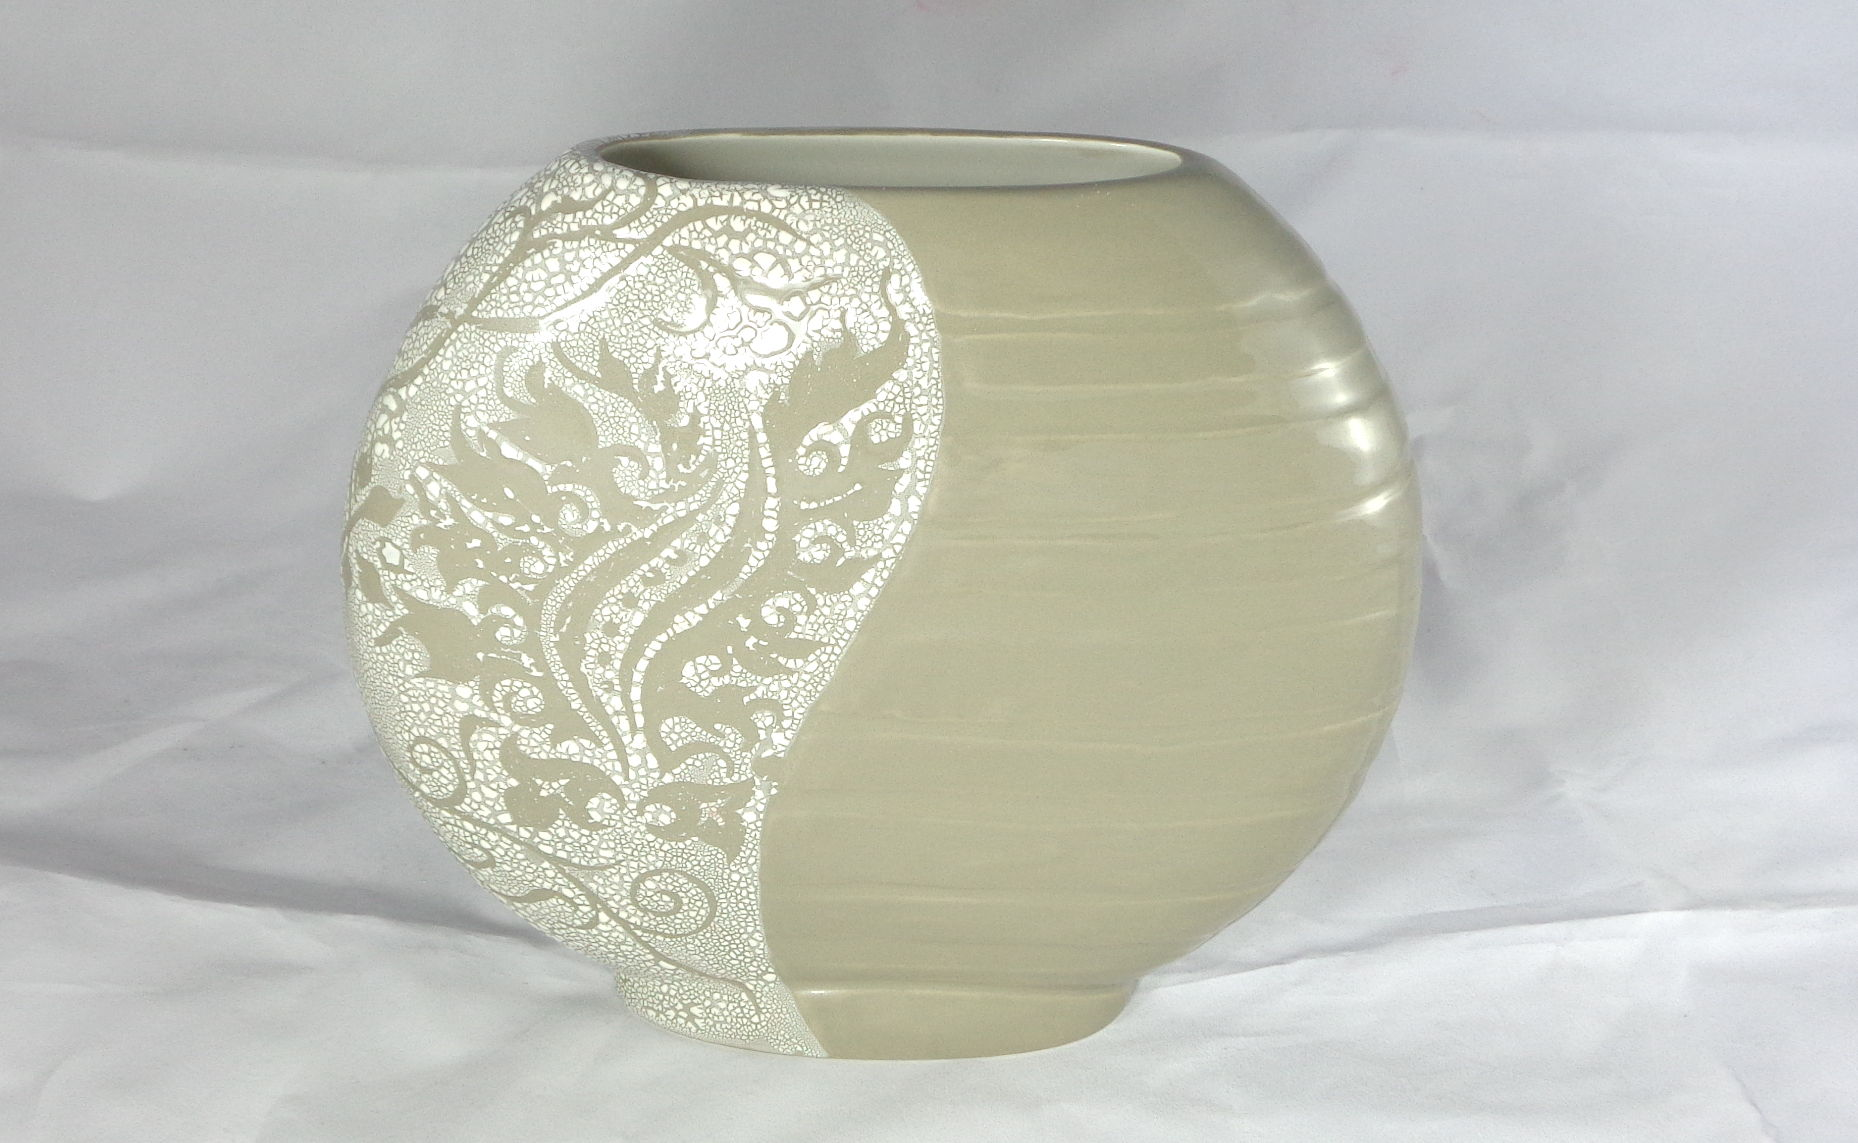 Bemalte Keramik Vase Diskus Cobblestone